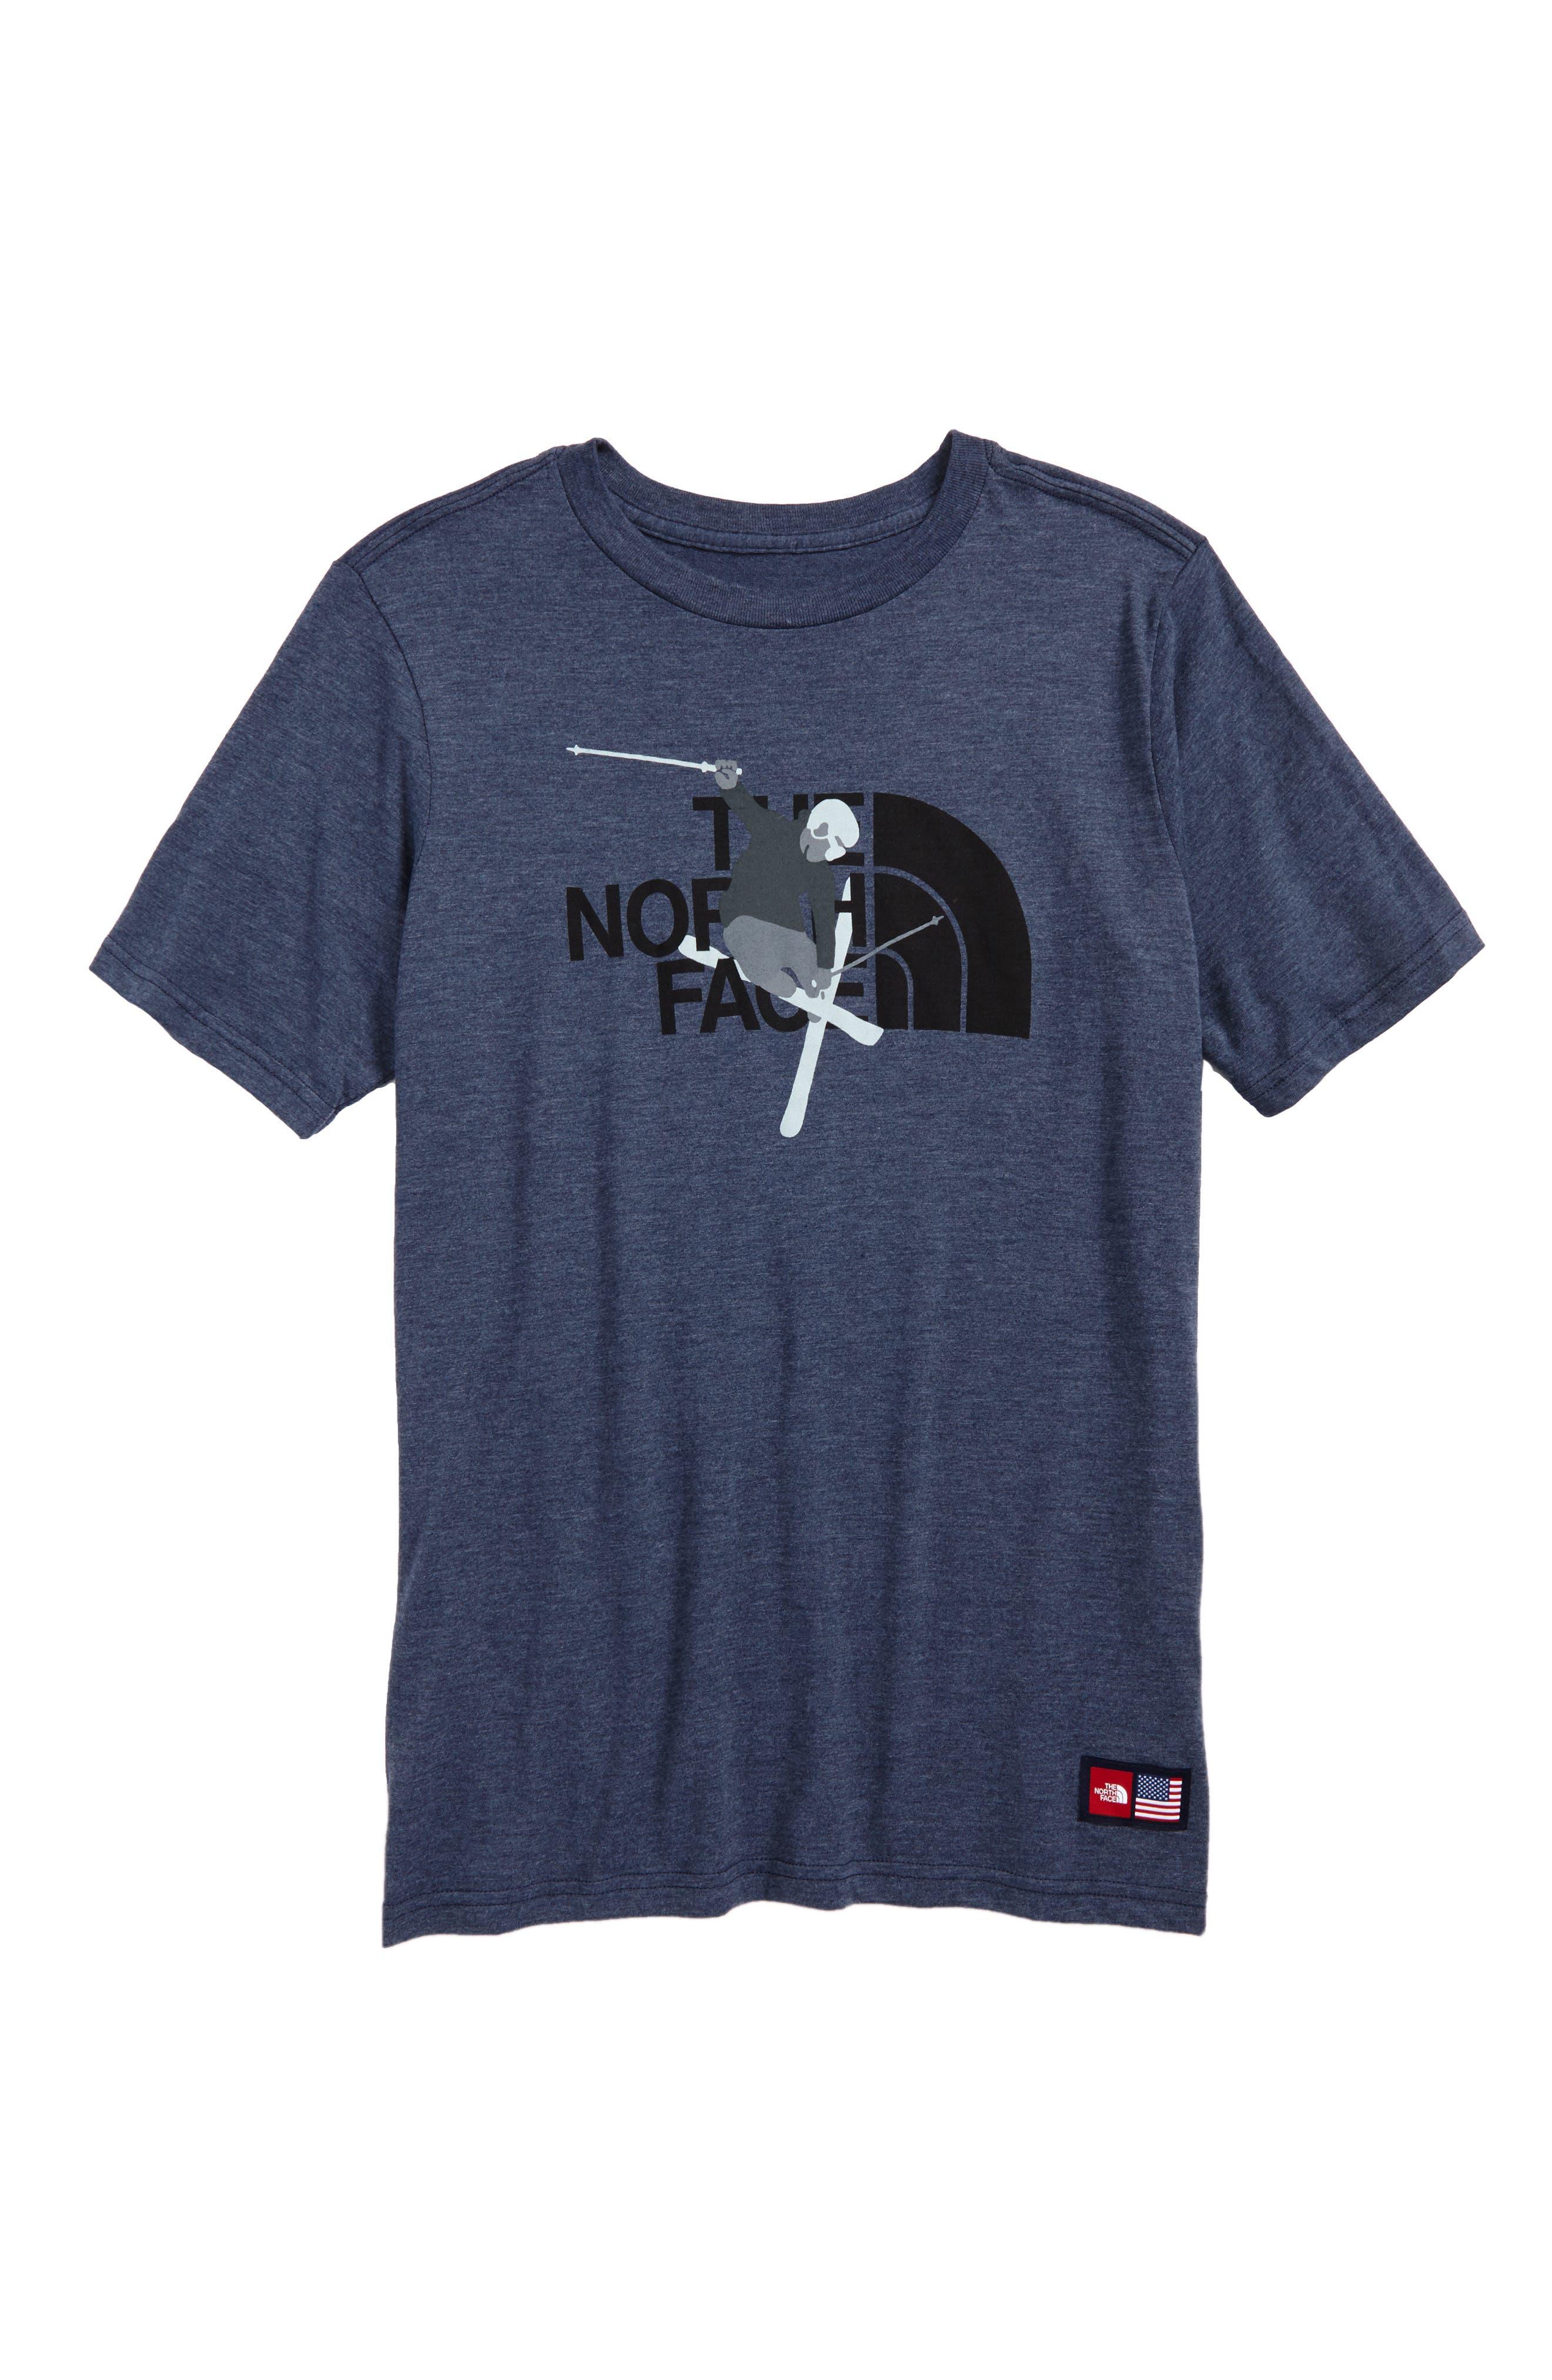 International Collection T-Shirt,                             Main thumbnail 1, color,